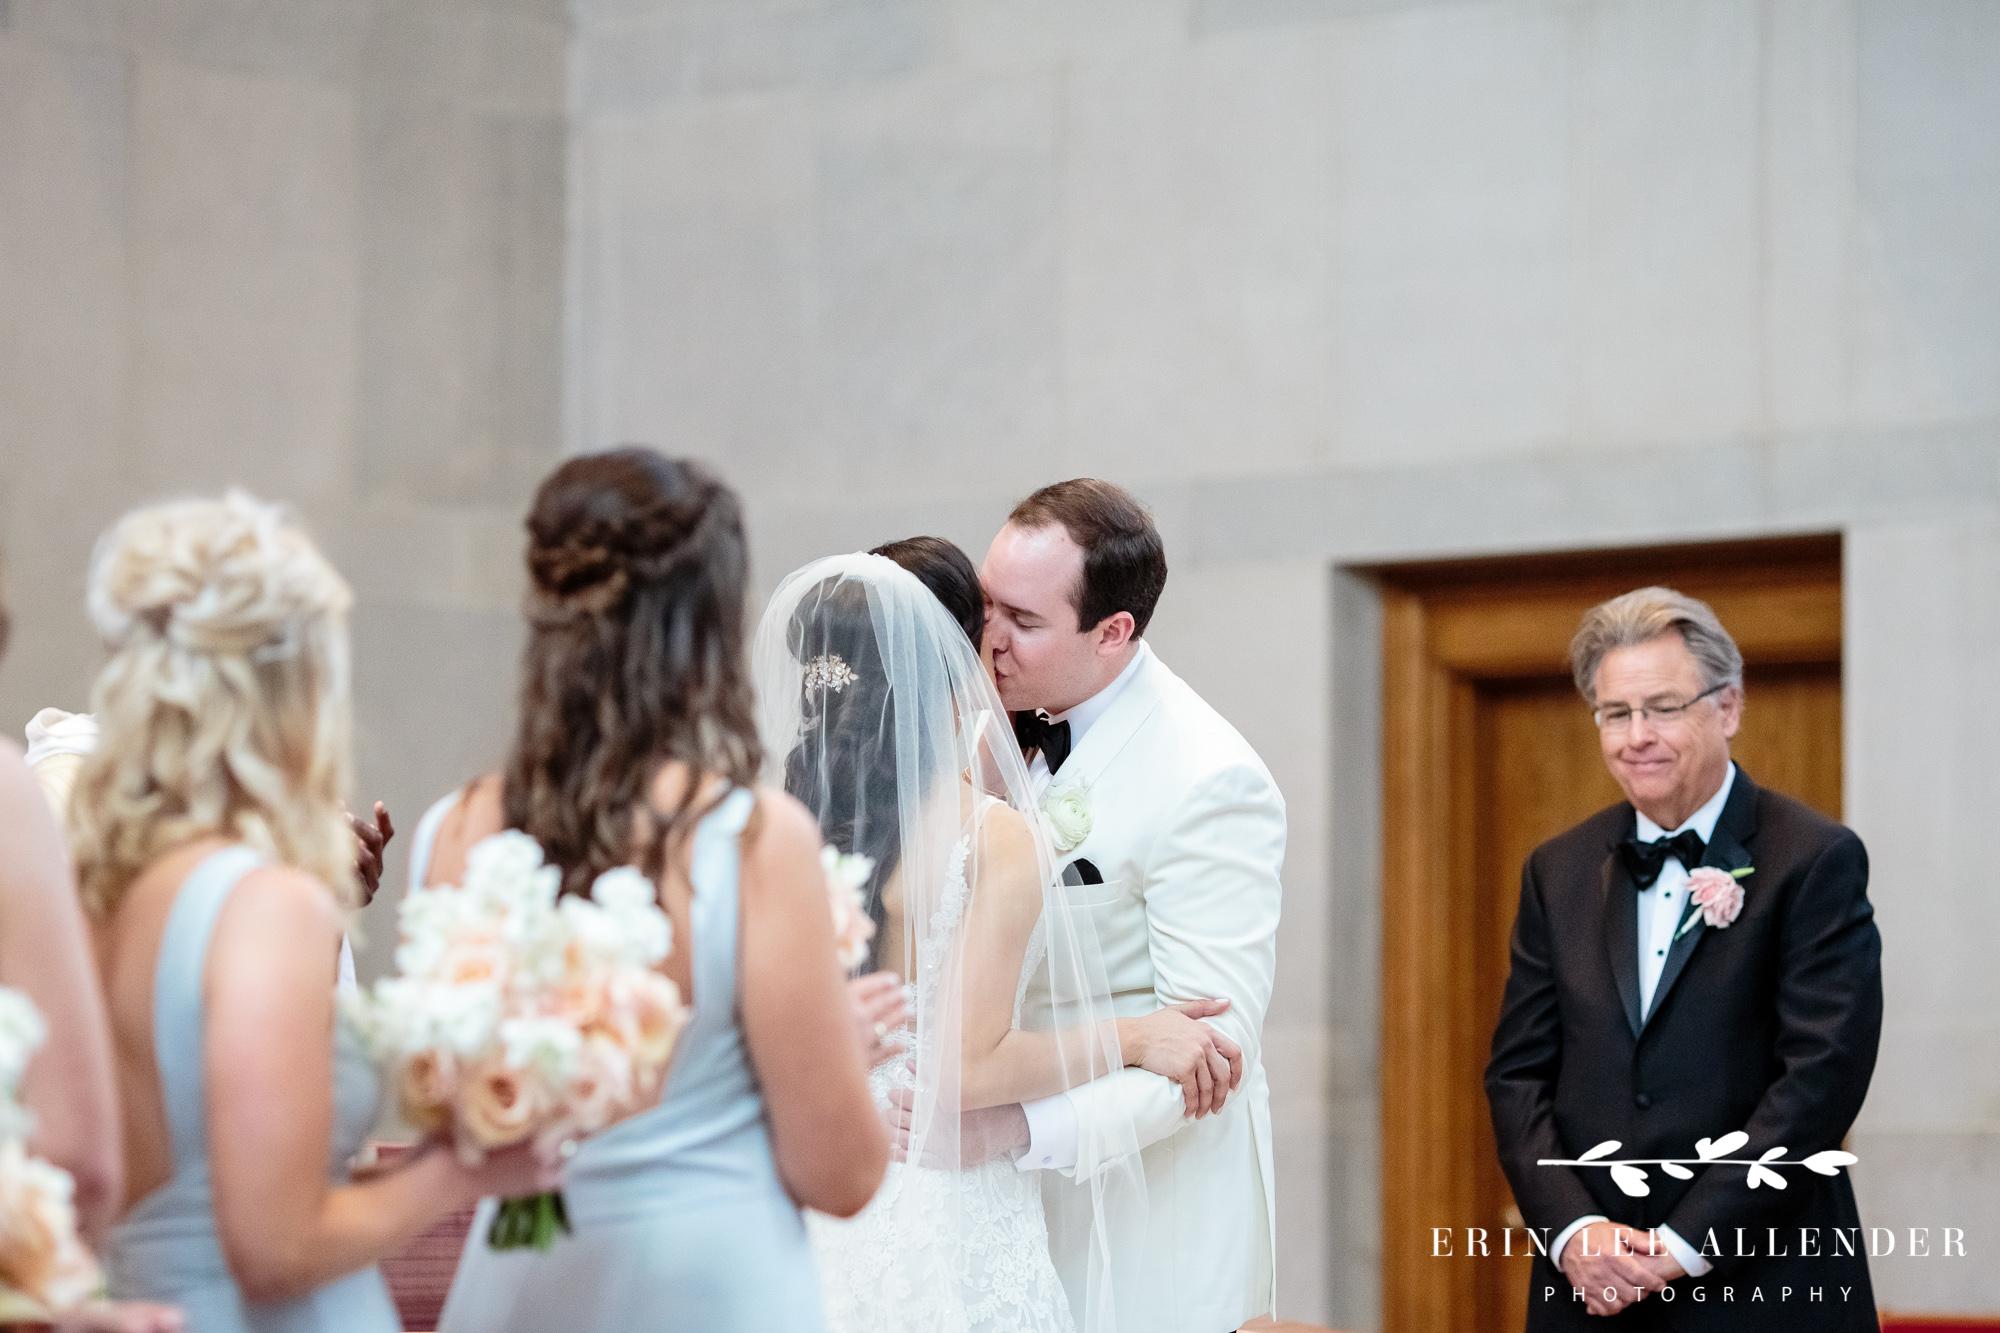 Bride-groom-kiss-at-alter